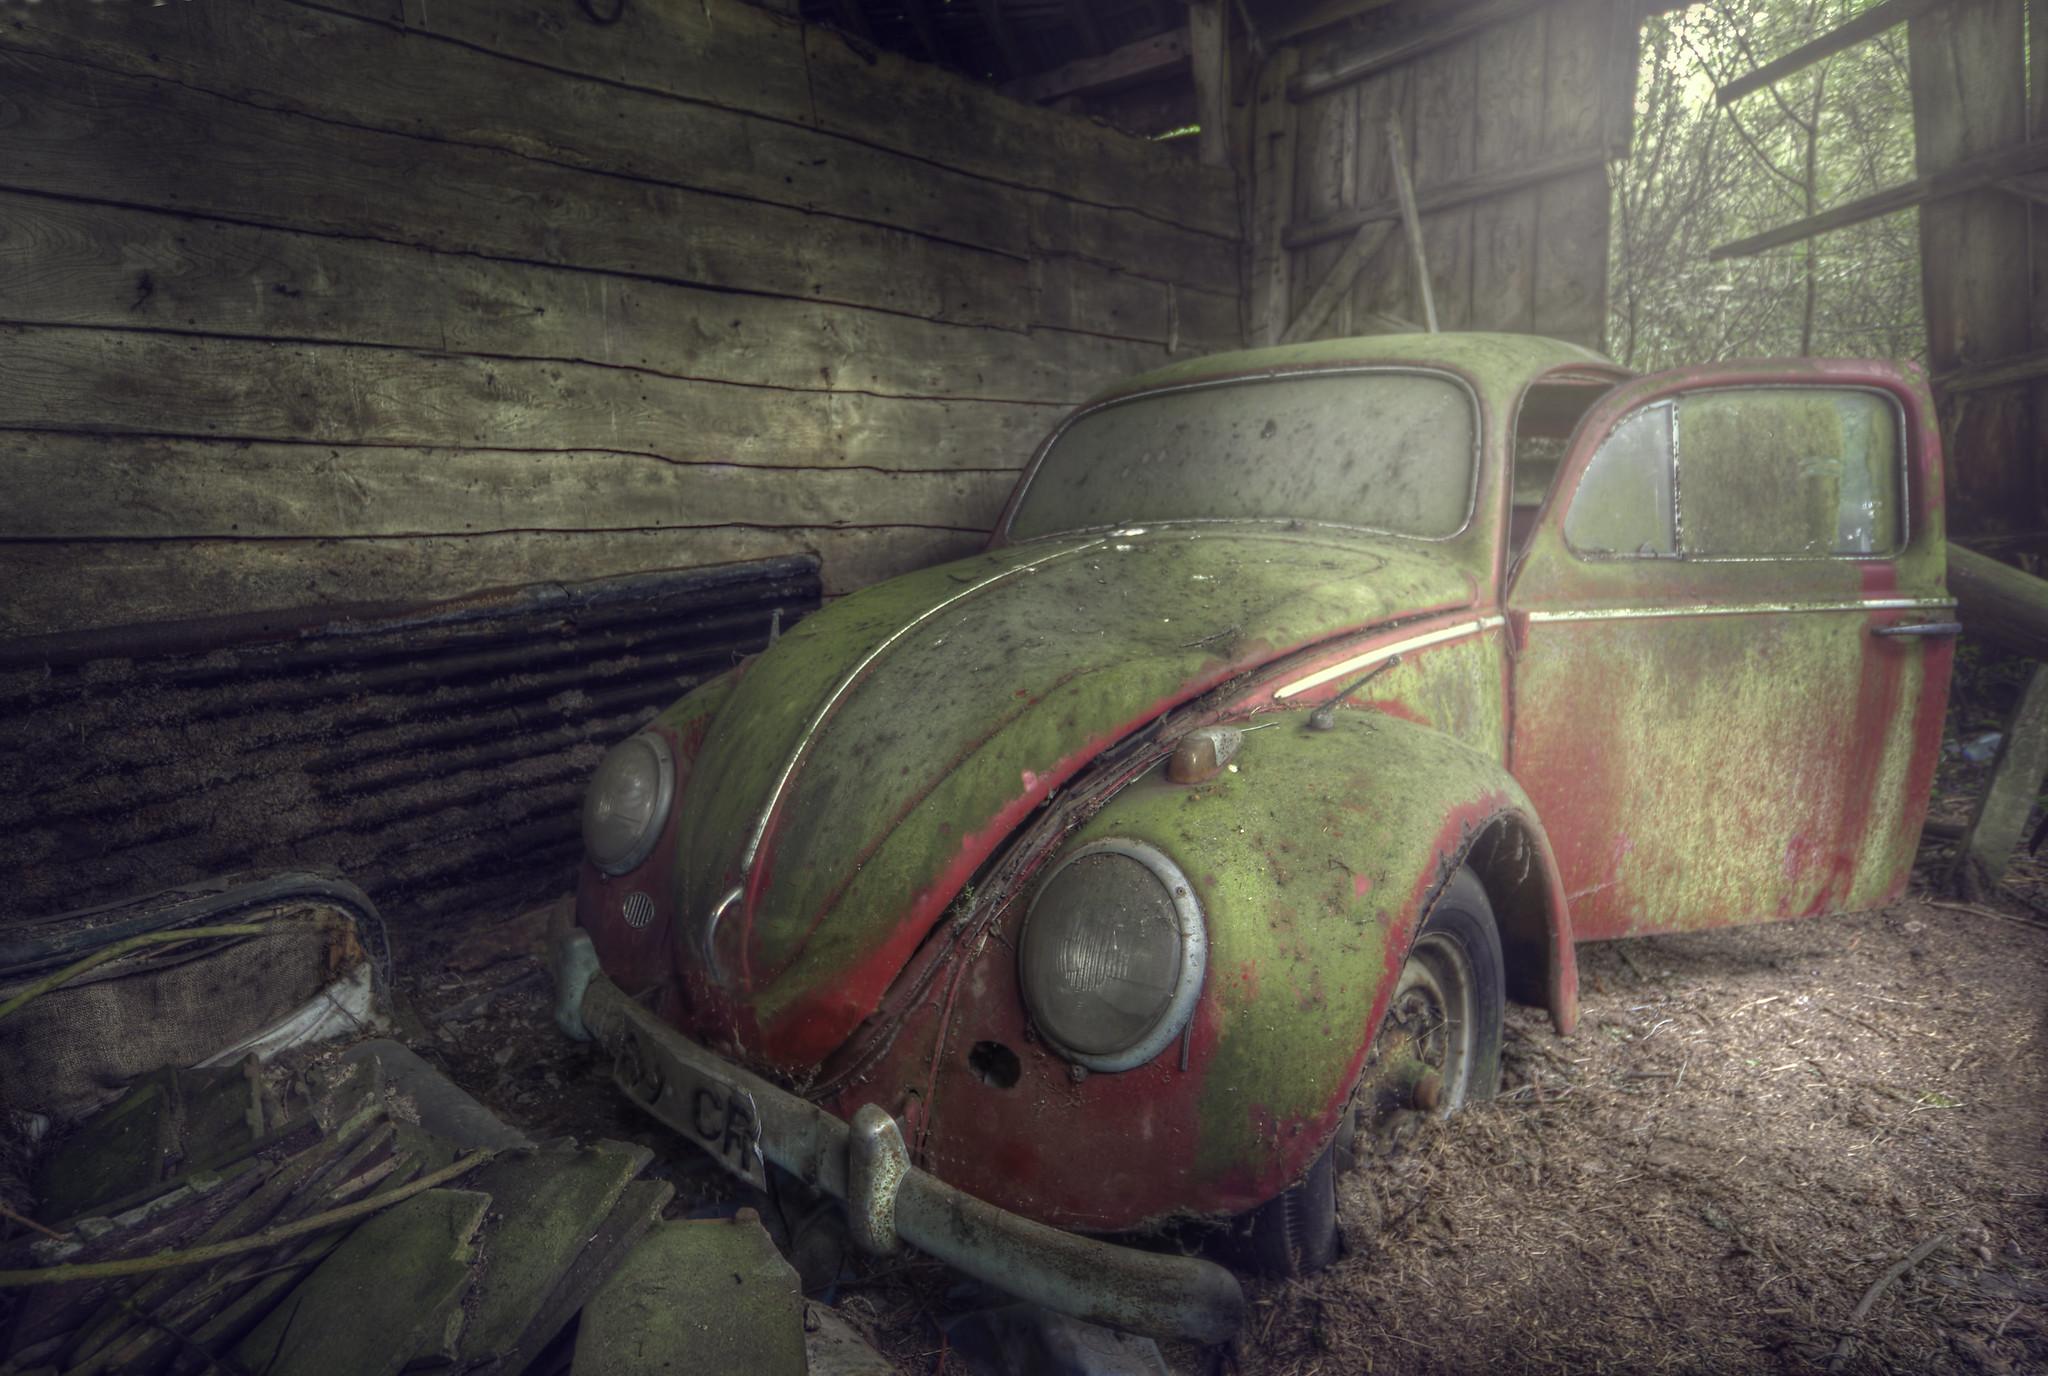 Bug In The Barn Barn Find Os 2048 X 1376